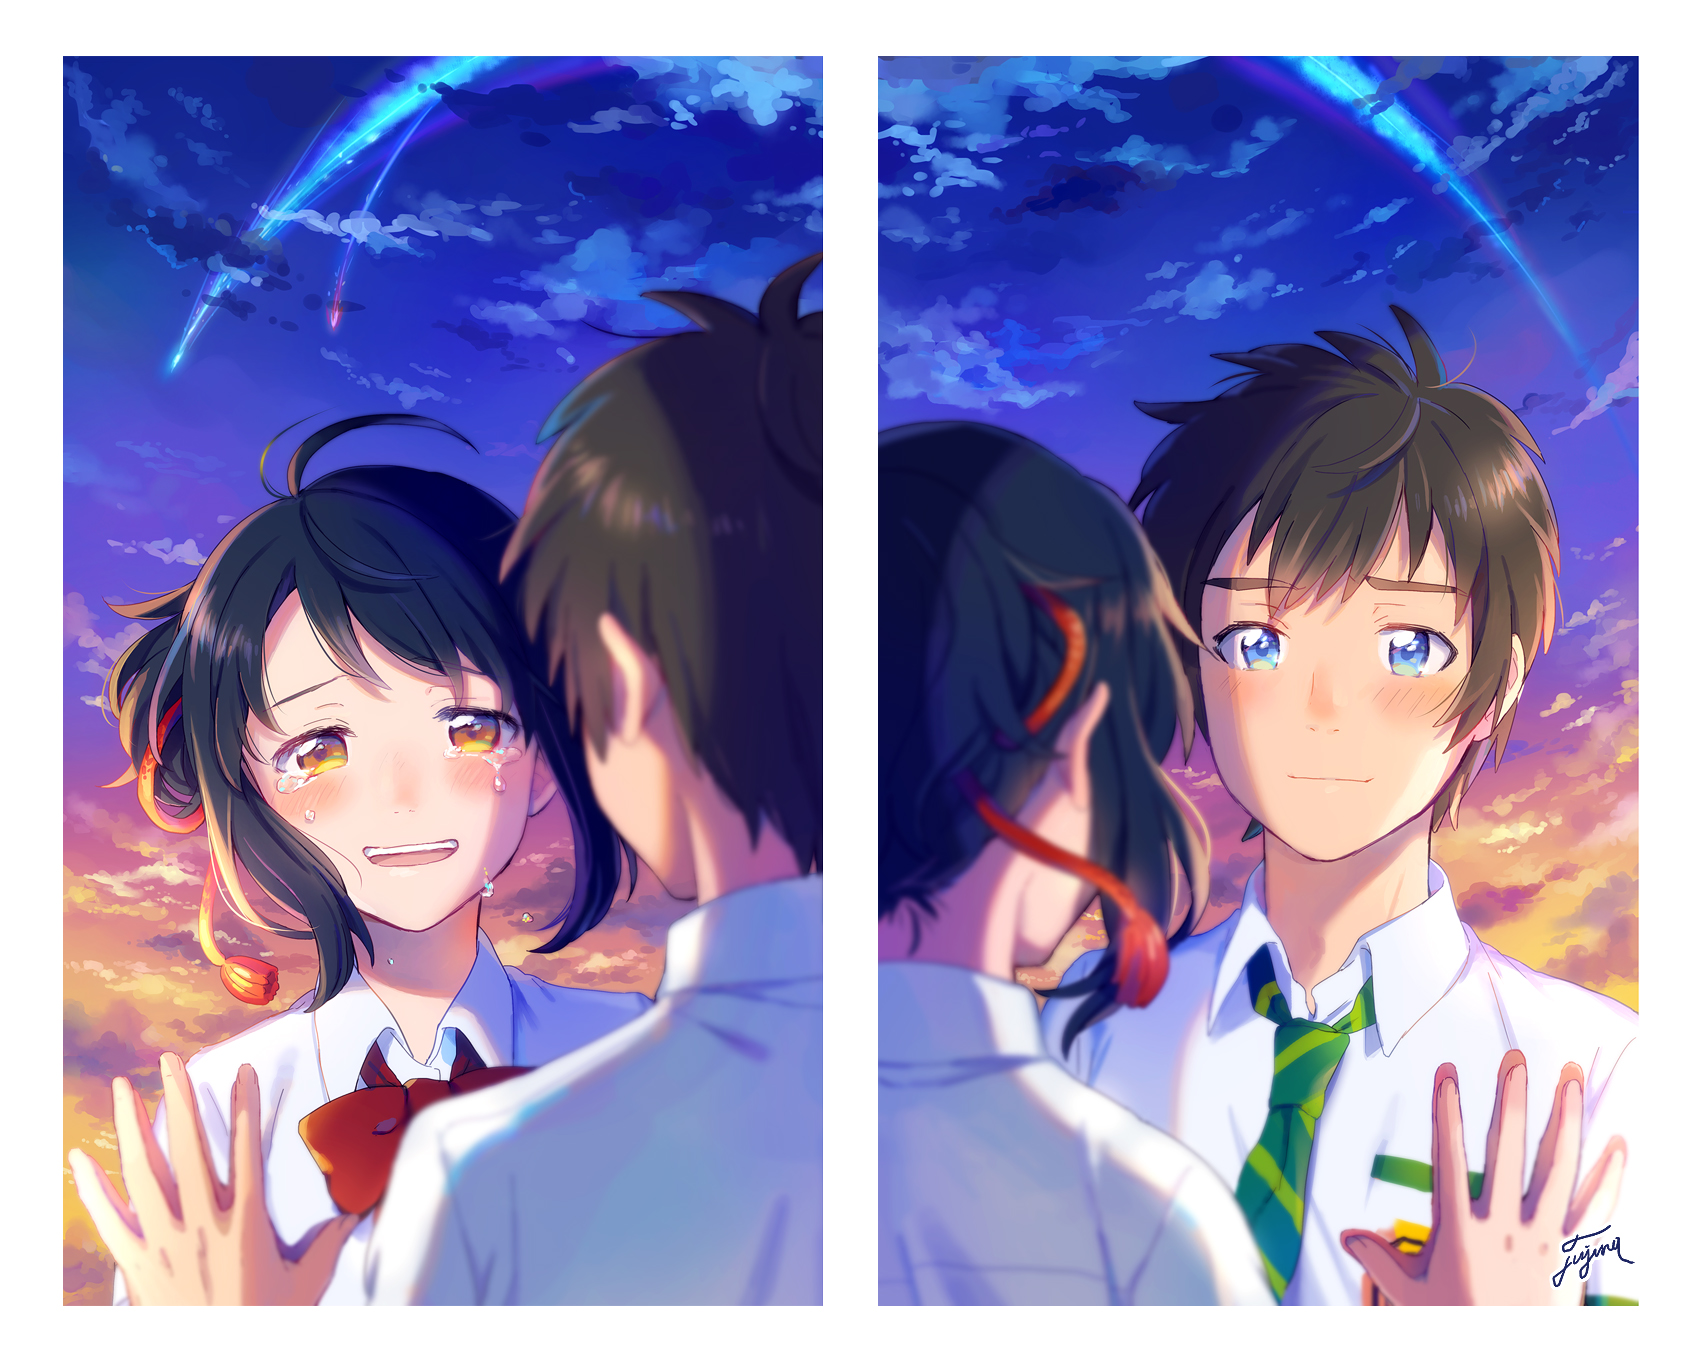 Your Name Download Kimi No Na Wa Image